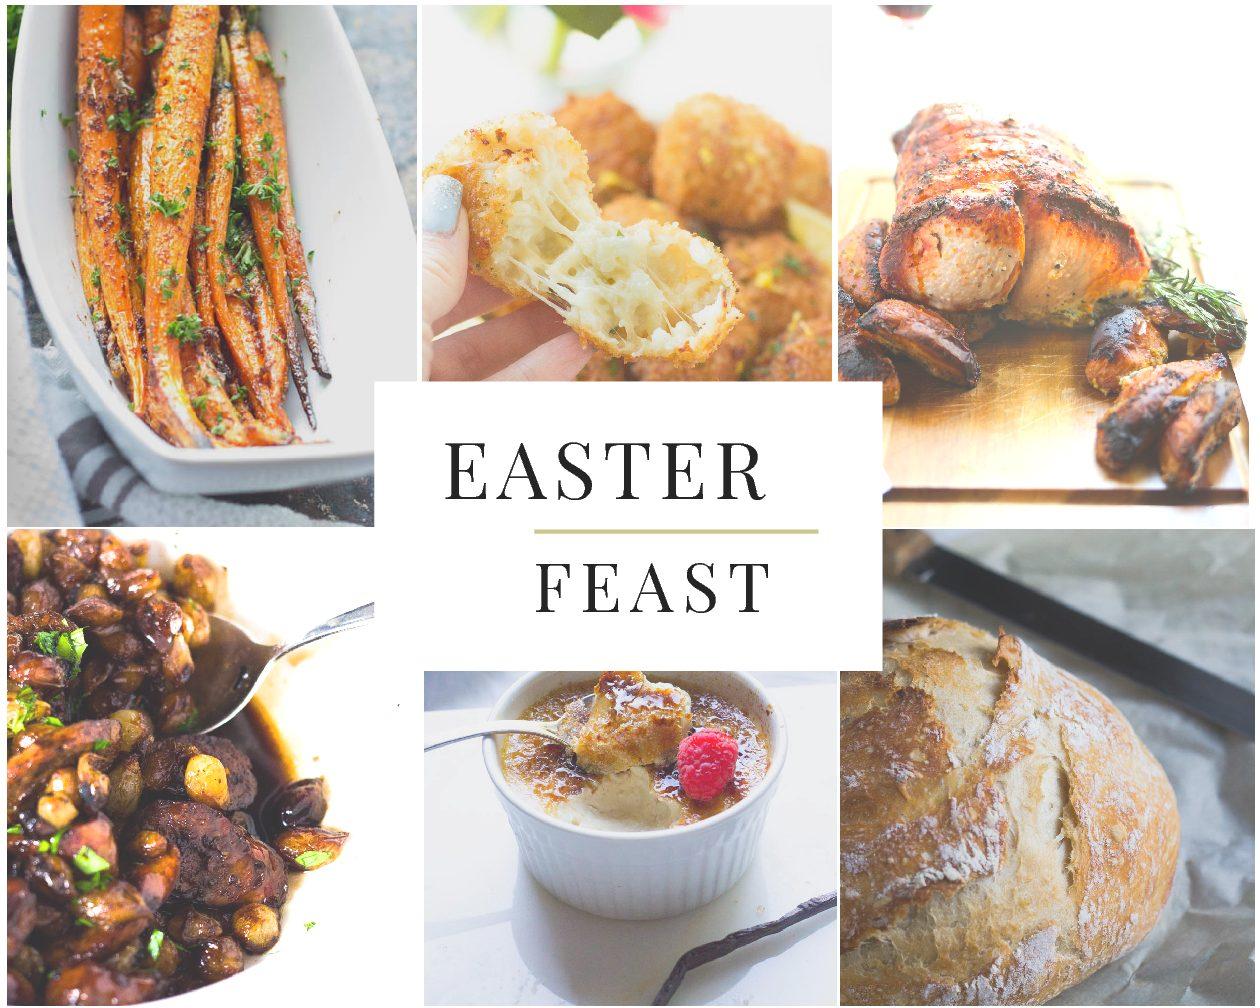 Easter Feast 2017